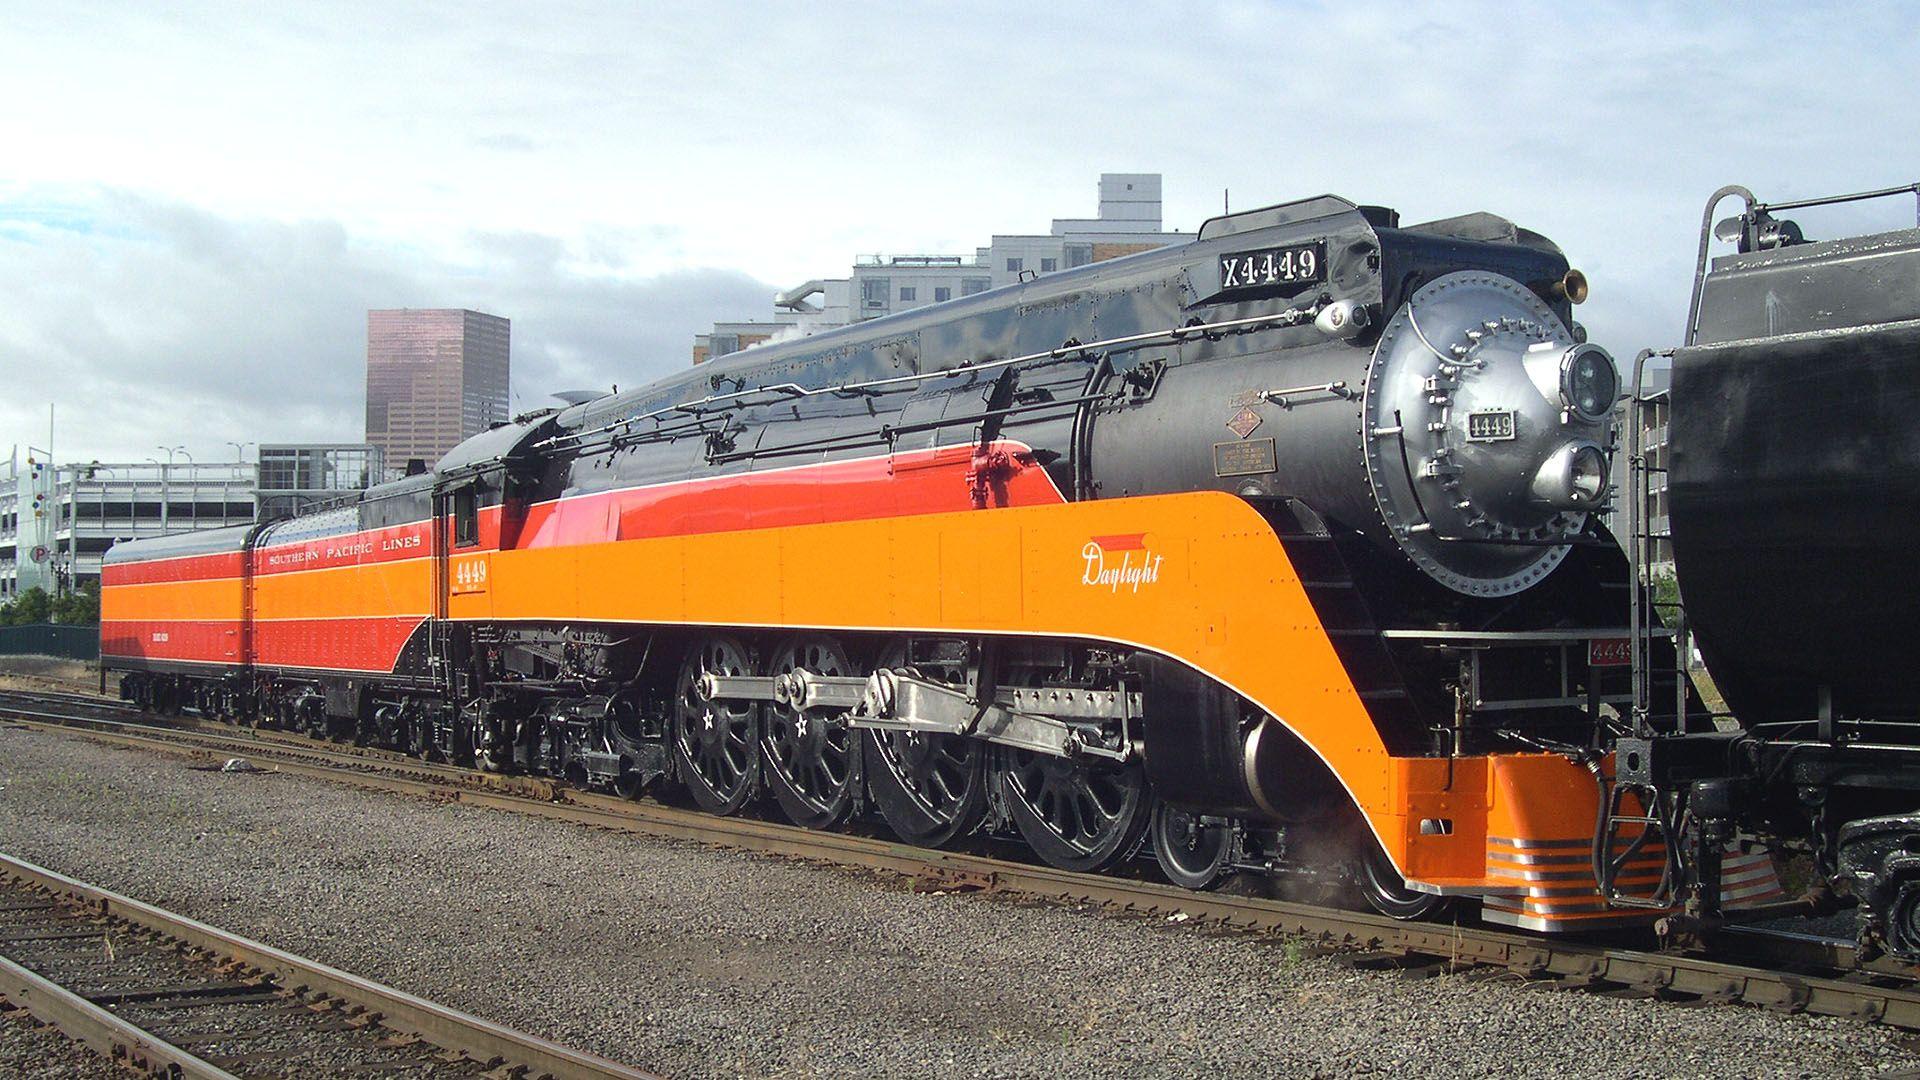 SP 4449. 蒸気機関車, 機関車, 乗り物